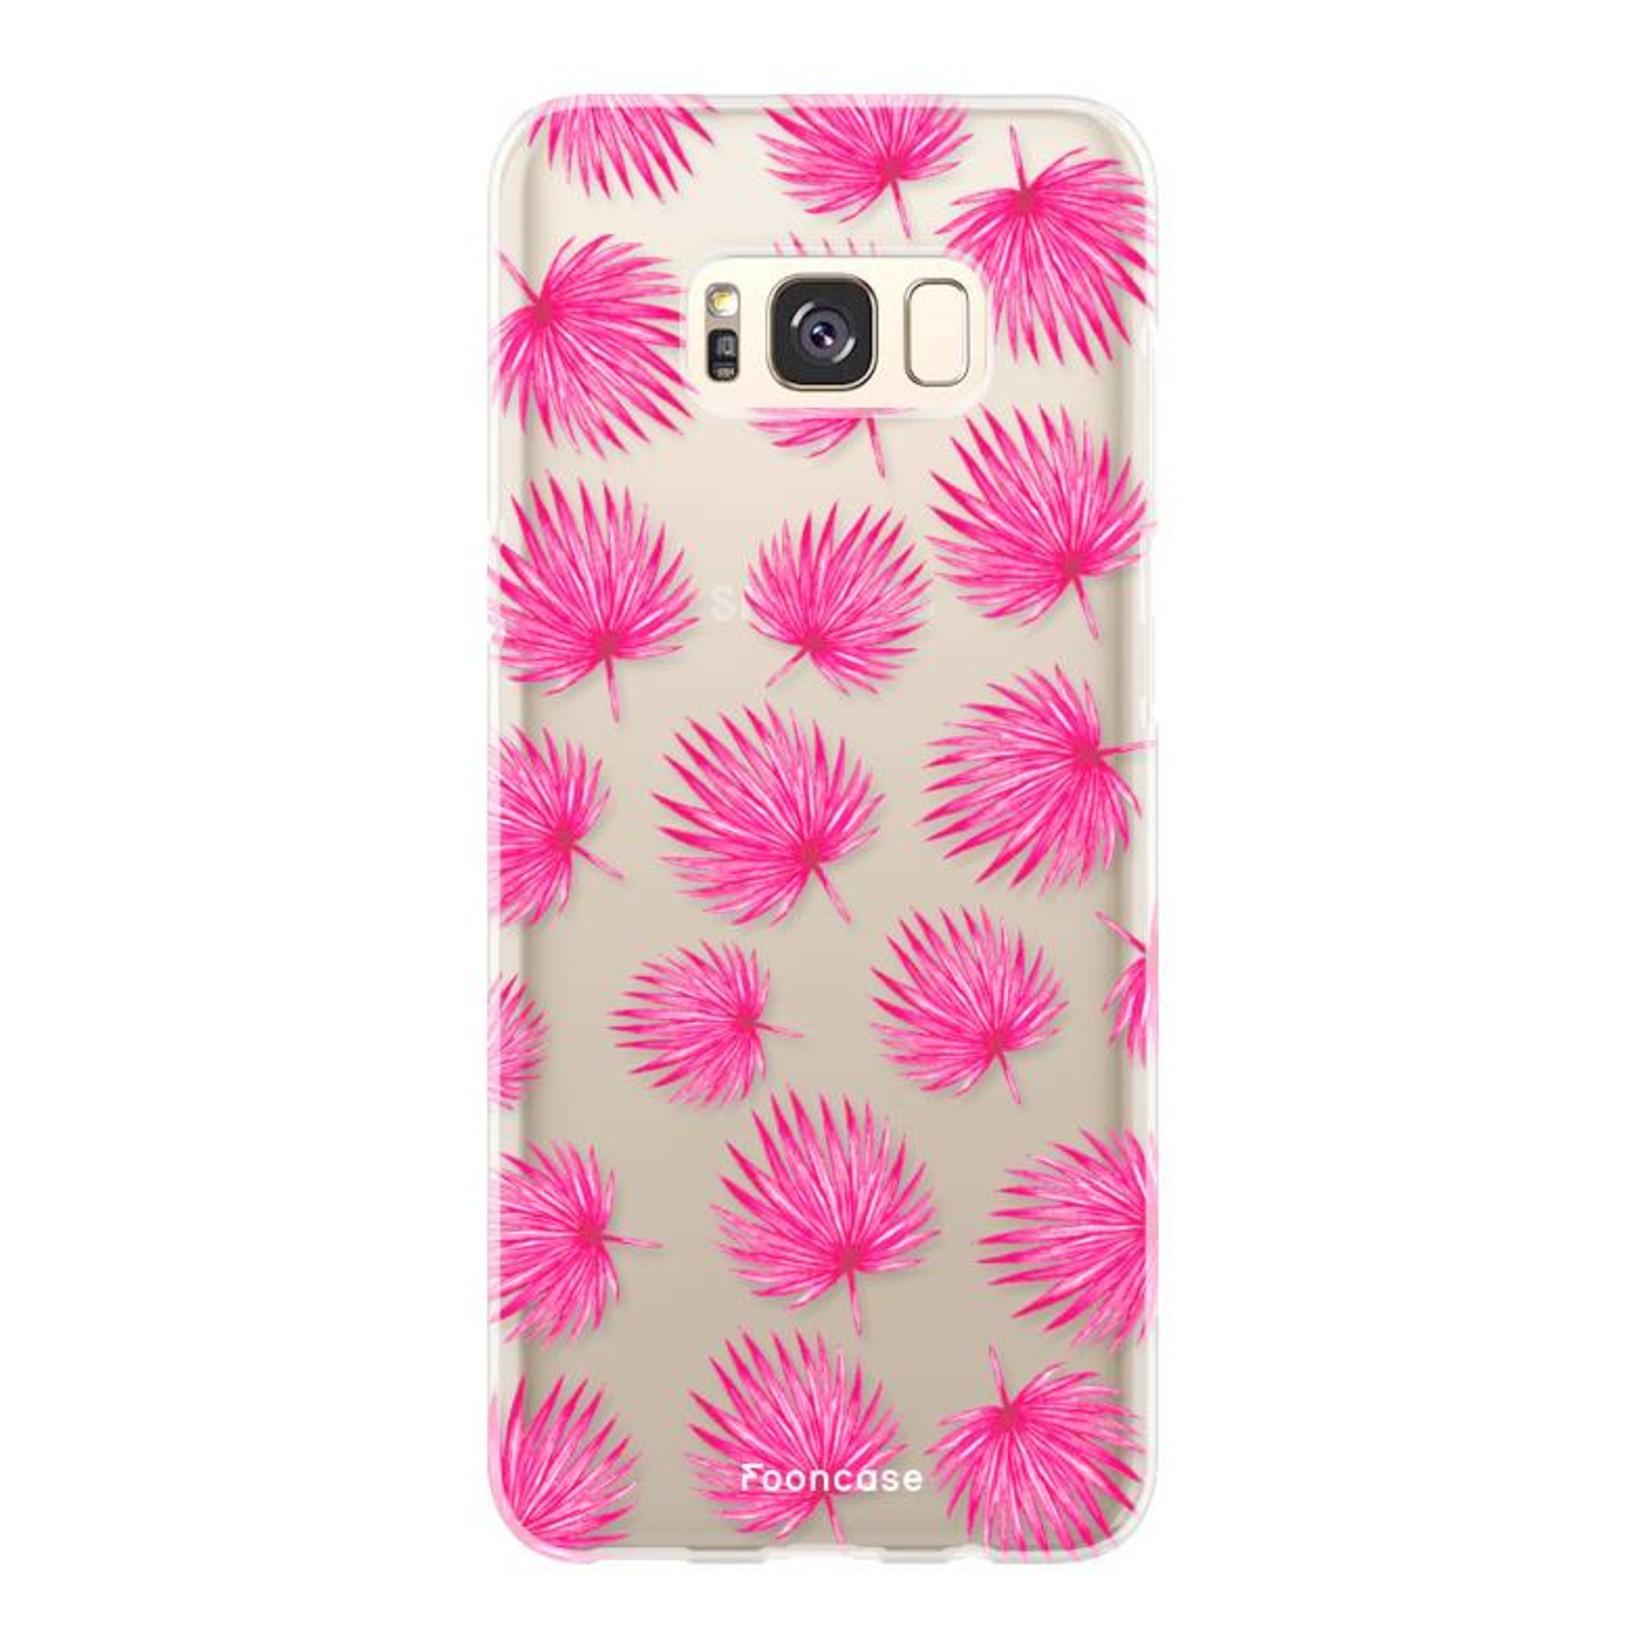 FOONCASE Samsung Galaxy S8 Handyhülle - Rosa Blätter